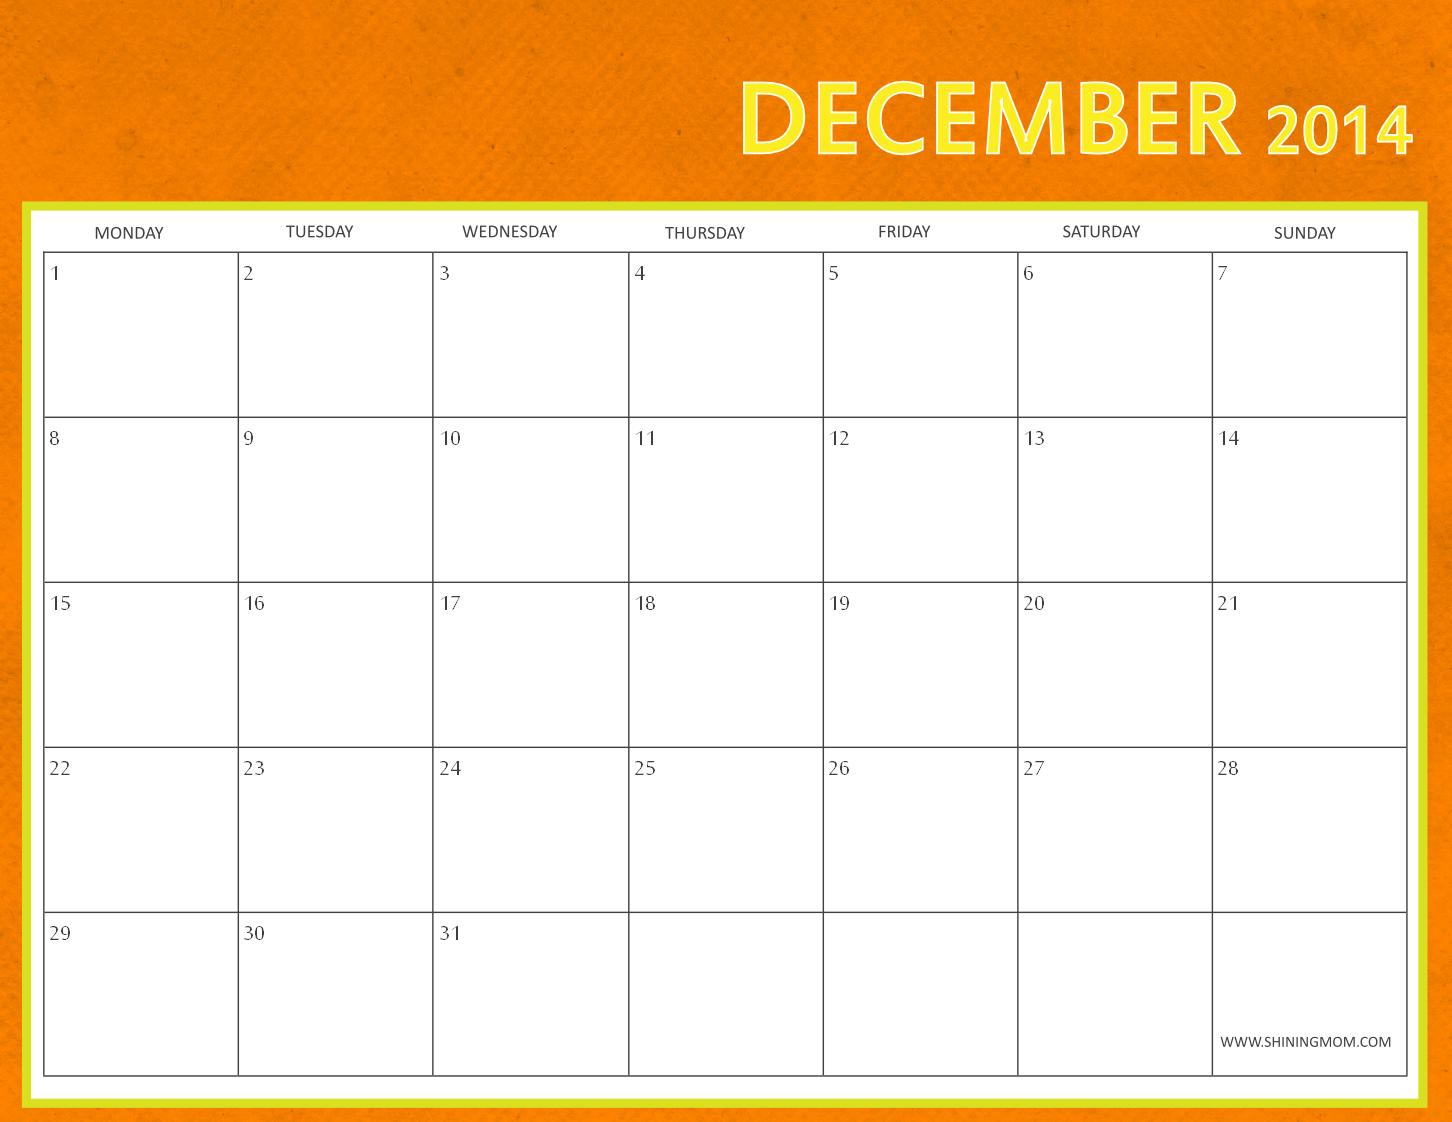 Free Printable December Calendar By Shining Mom